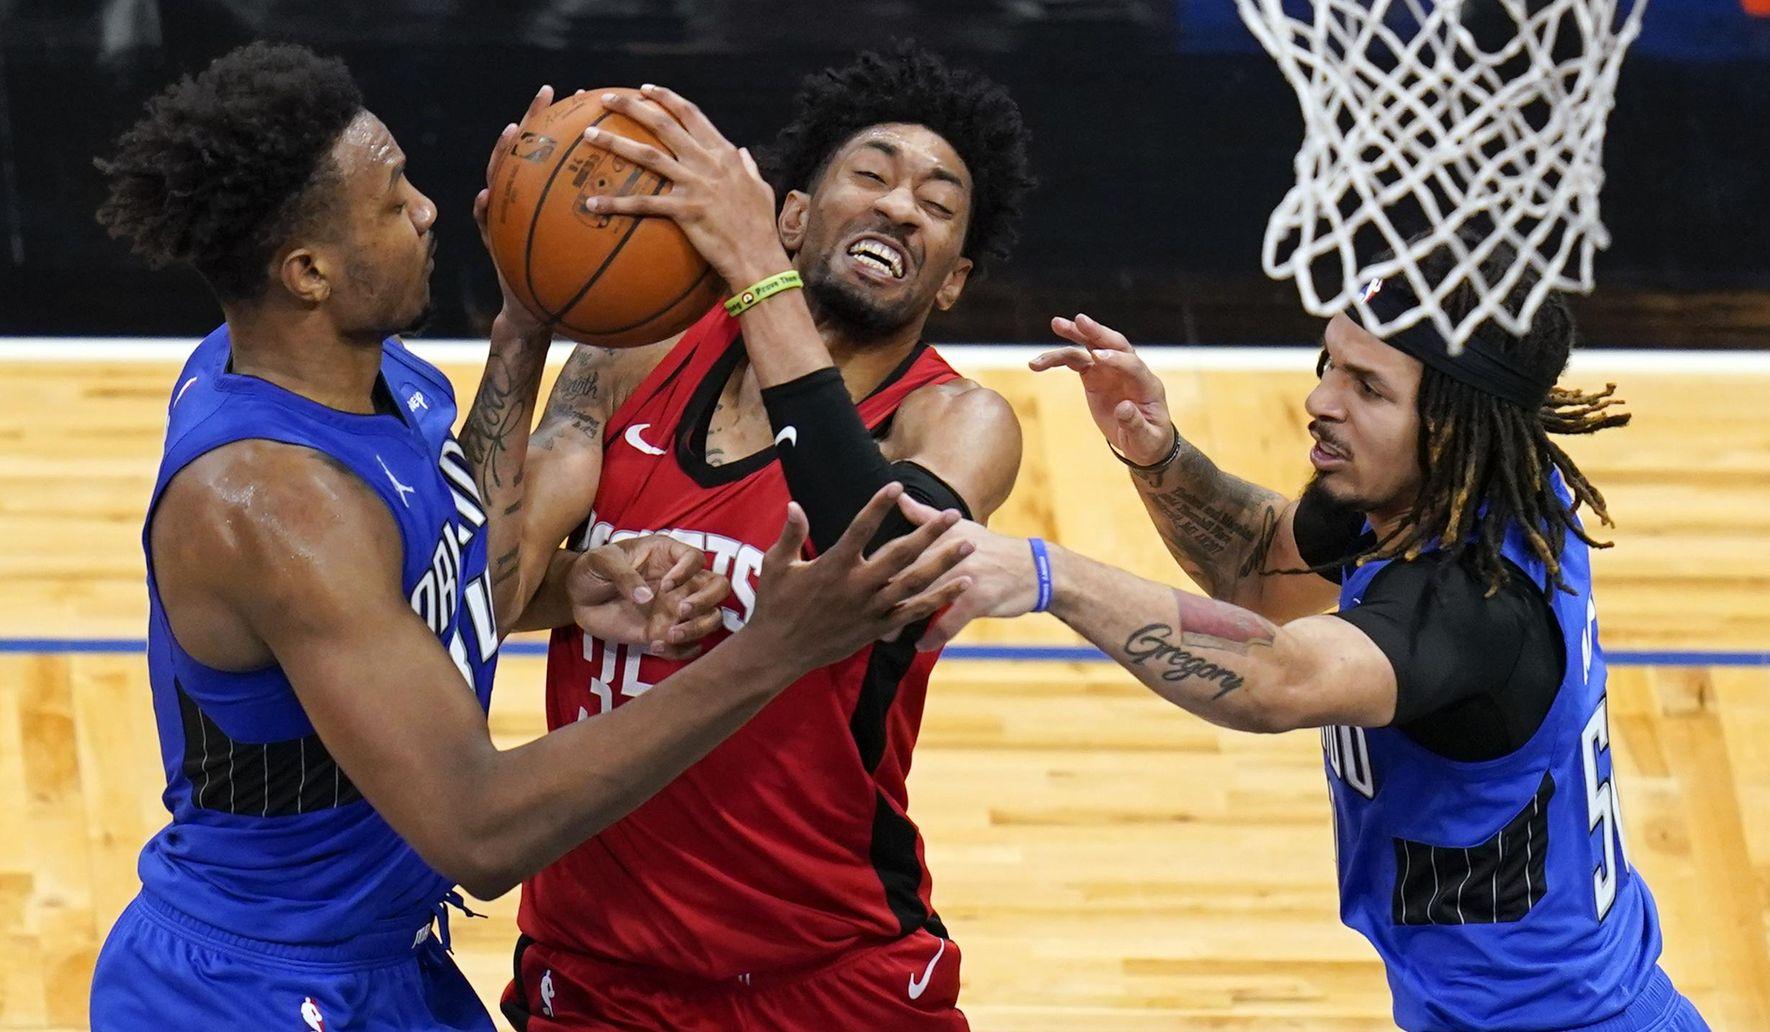 Rockets_magic_basketball_94642_c0-103-2456-1534_s1770x1032